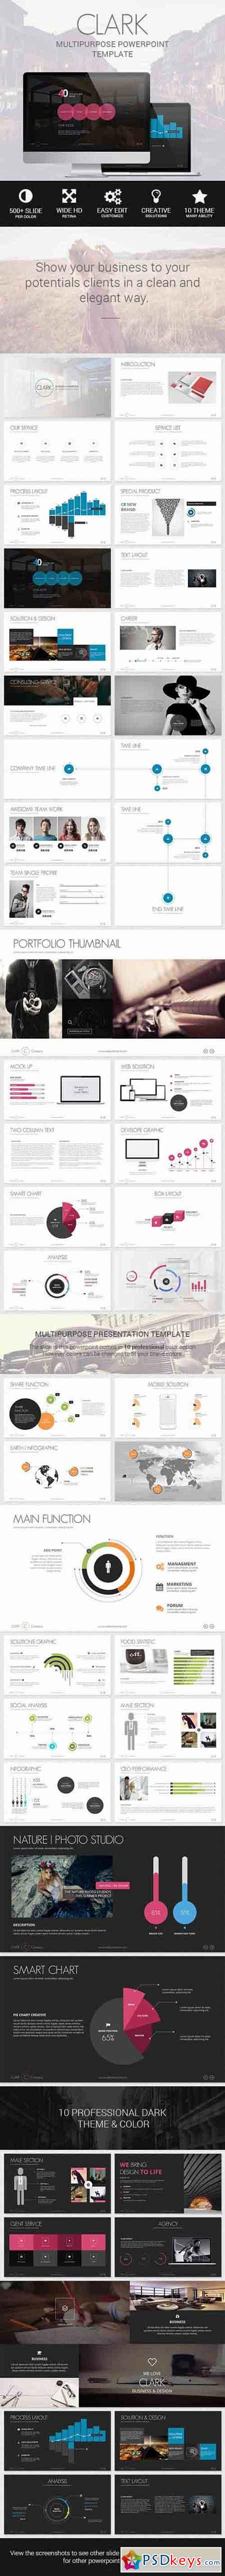 Clark - Business & Marketing Creative Template 8324349